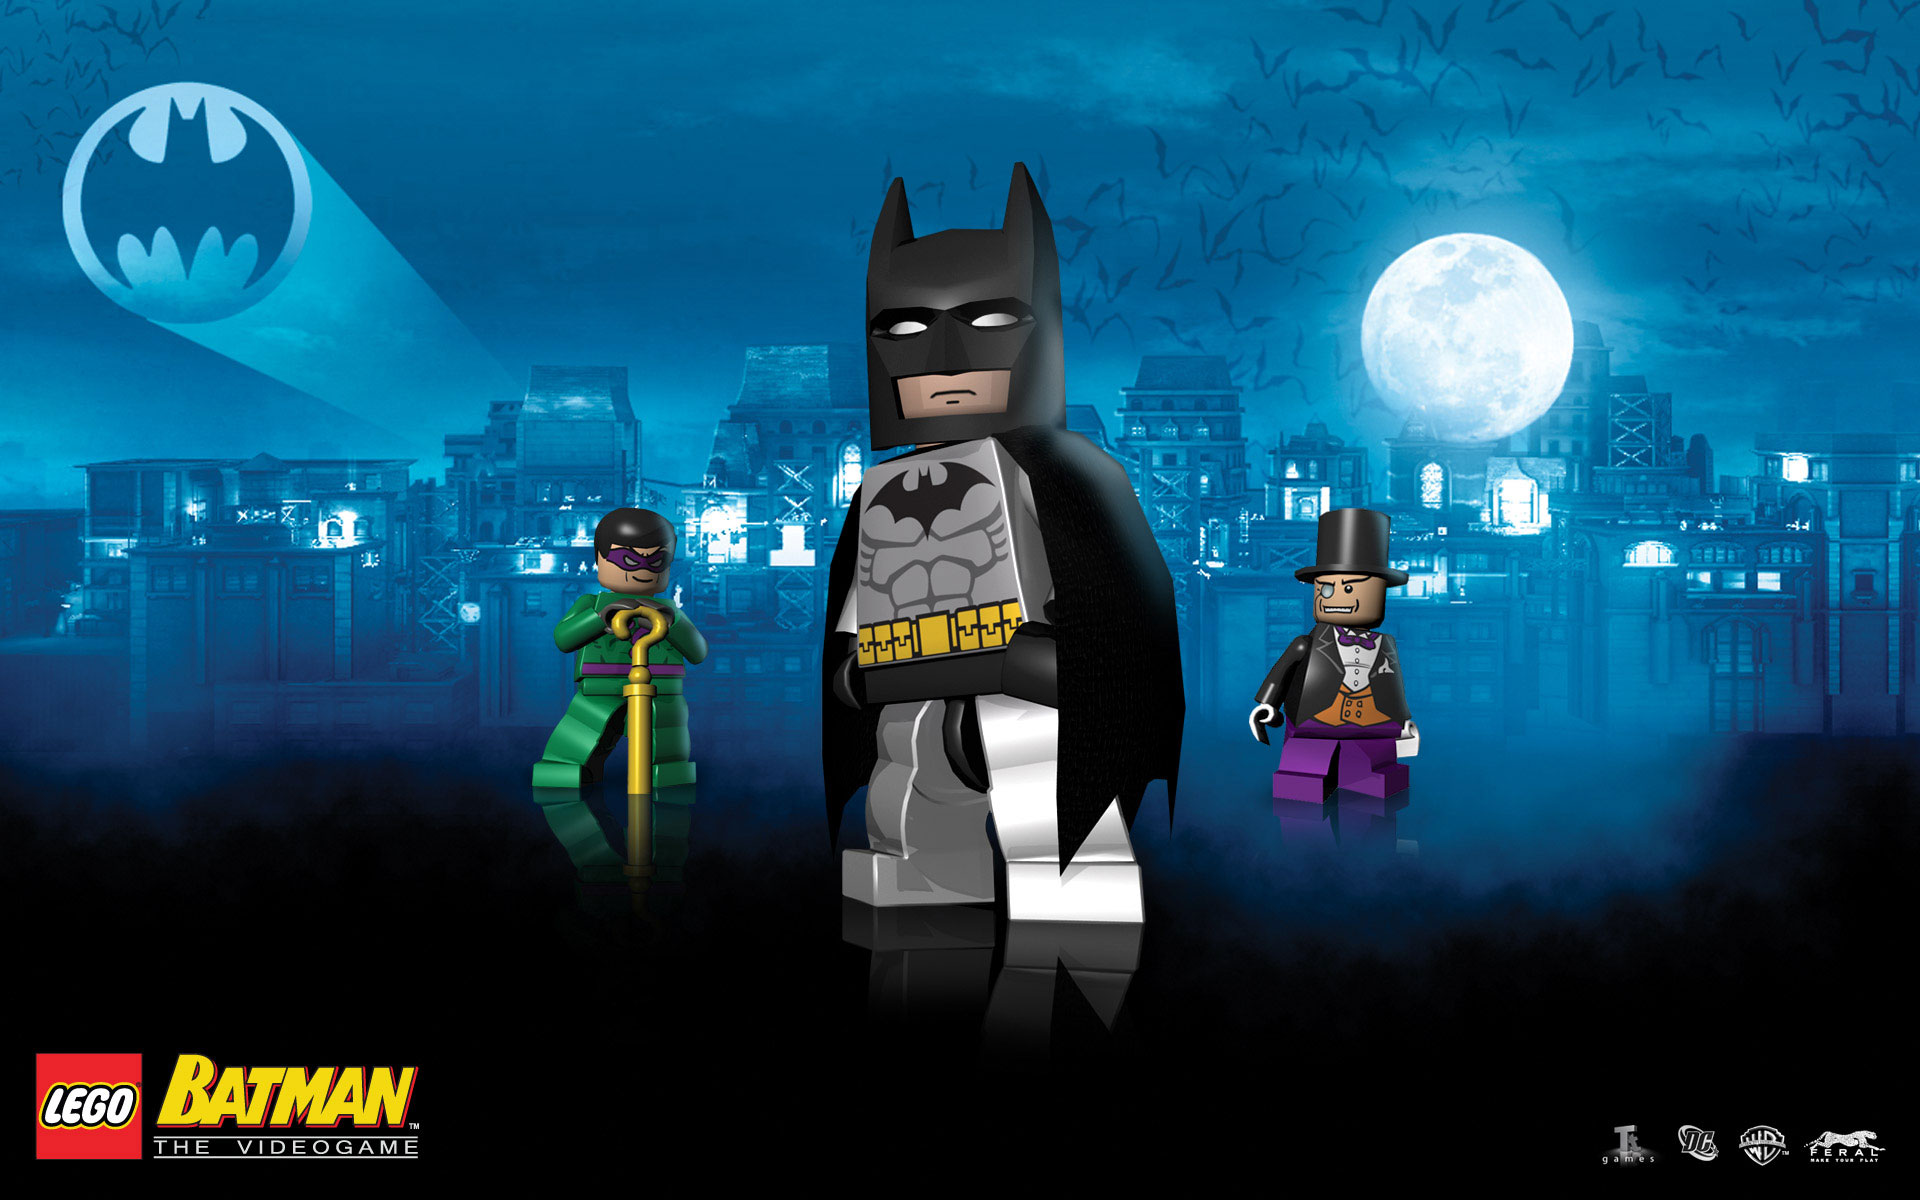 The Videogame Wallpaper Lego Batman Video Game 372859